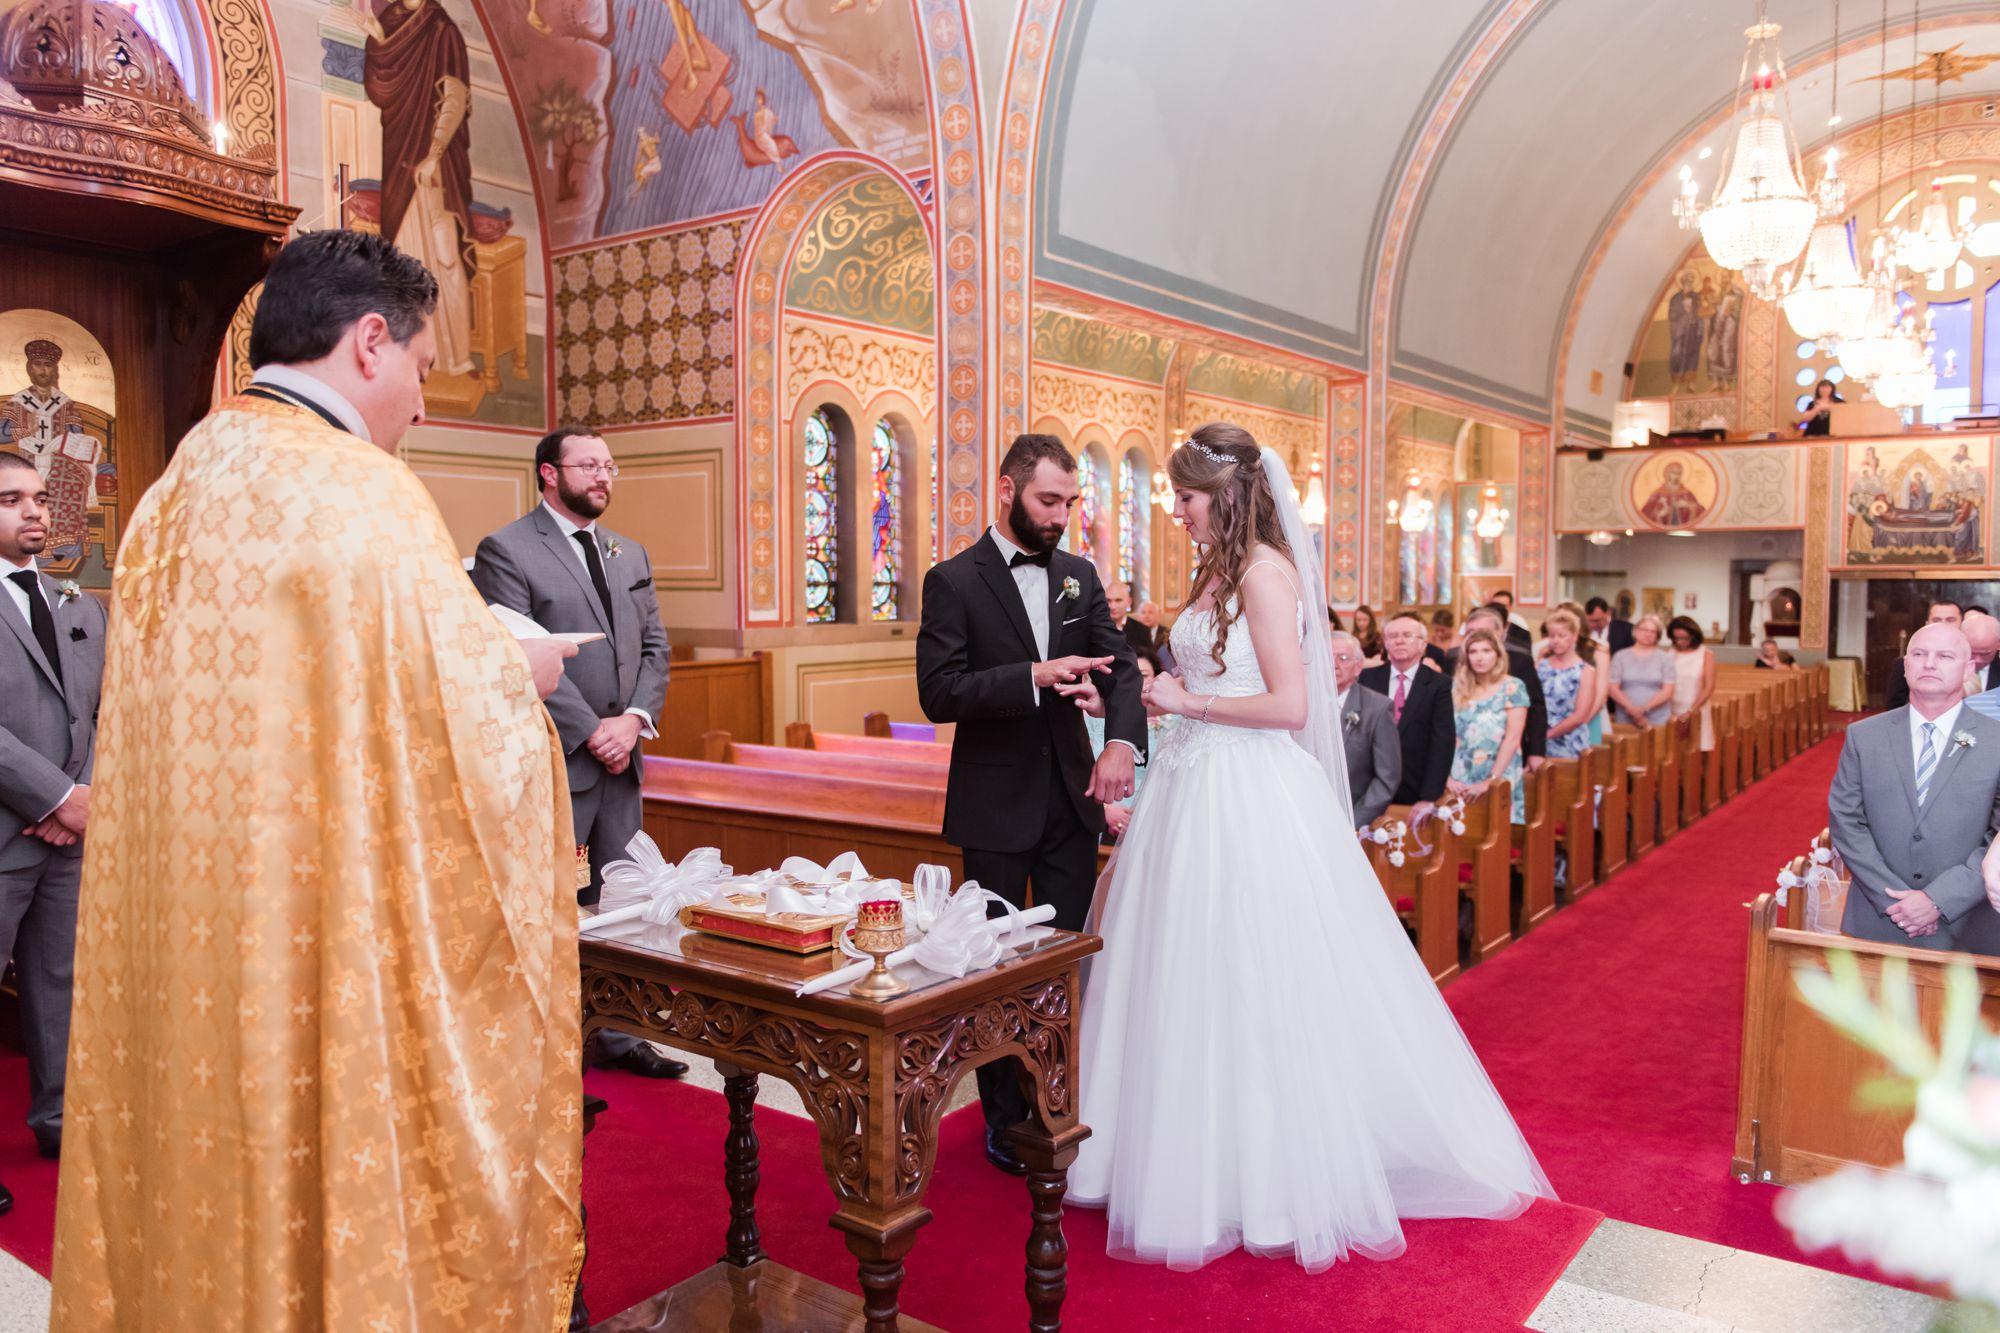 uptown-charlotte-orthodox-greek-wedding 59